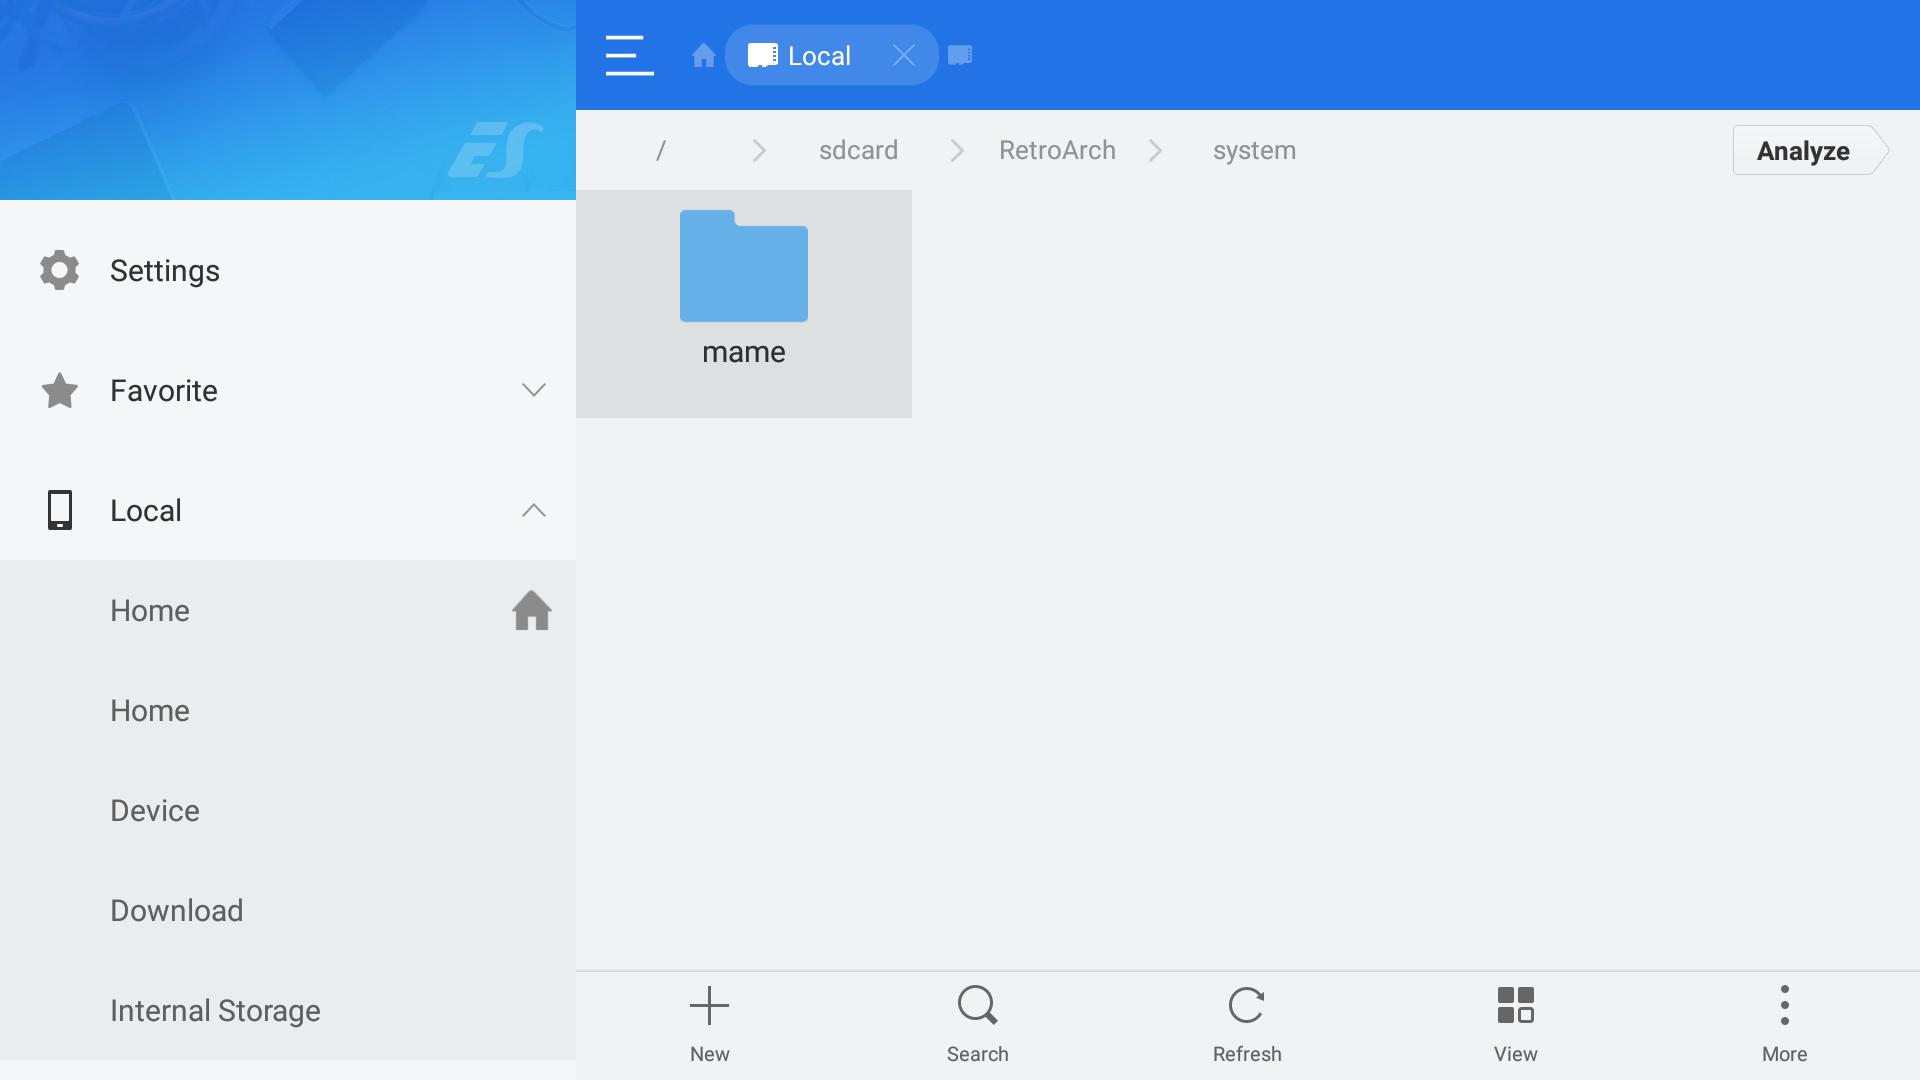 Mess System Bios Roms For Mame Emulator - portfasr